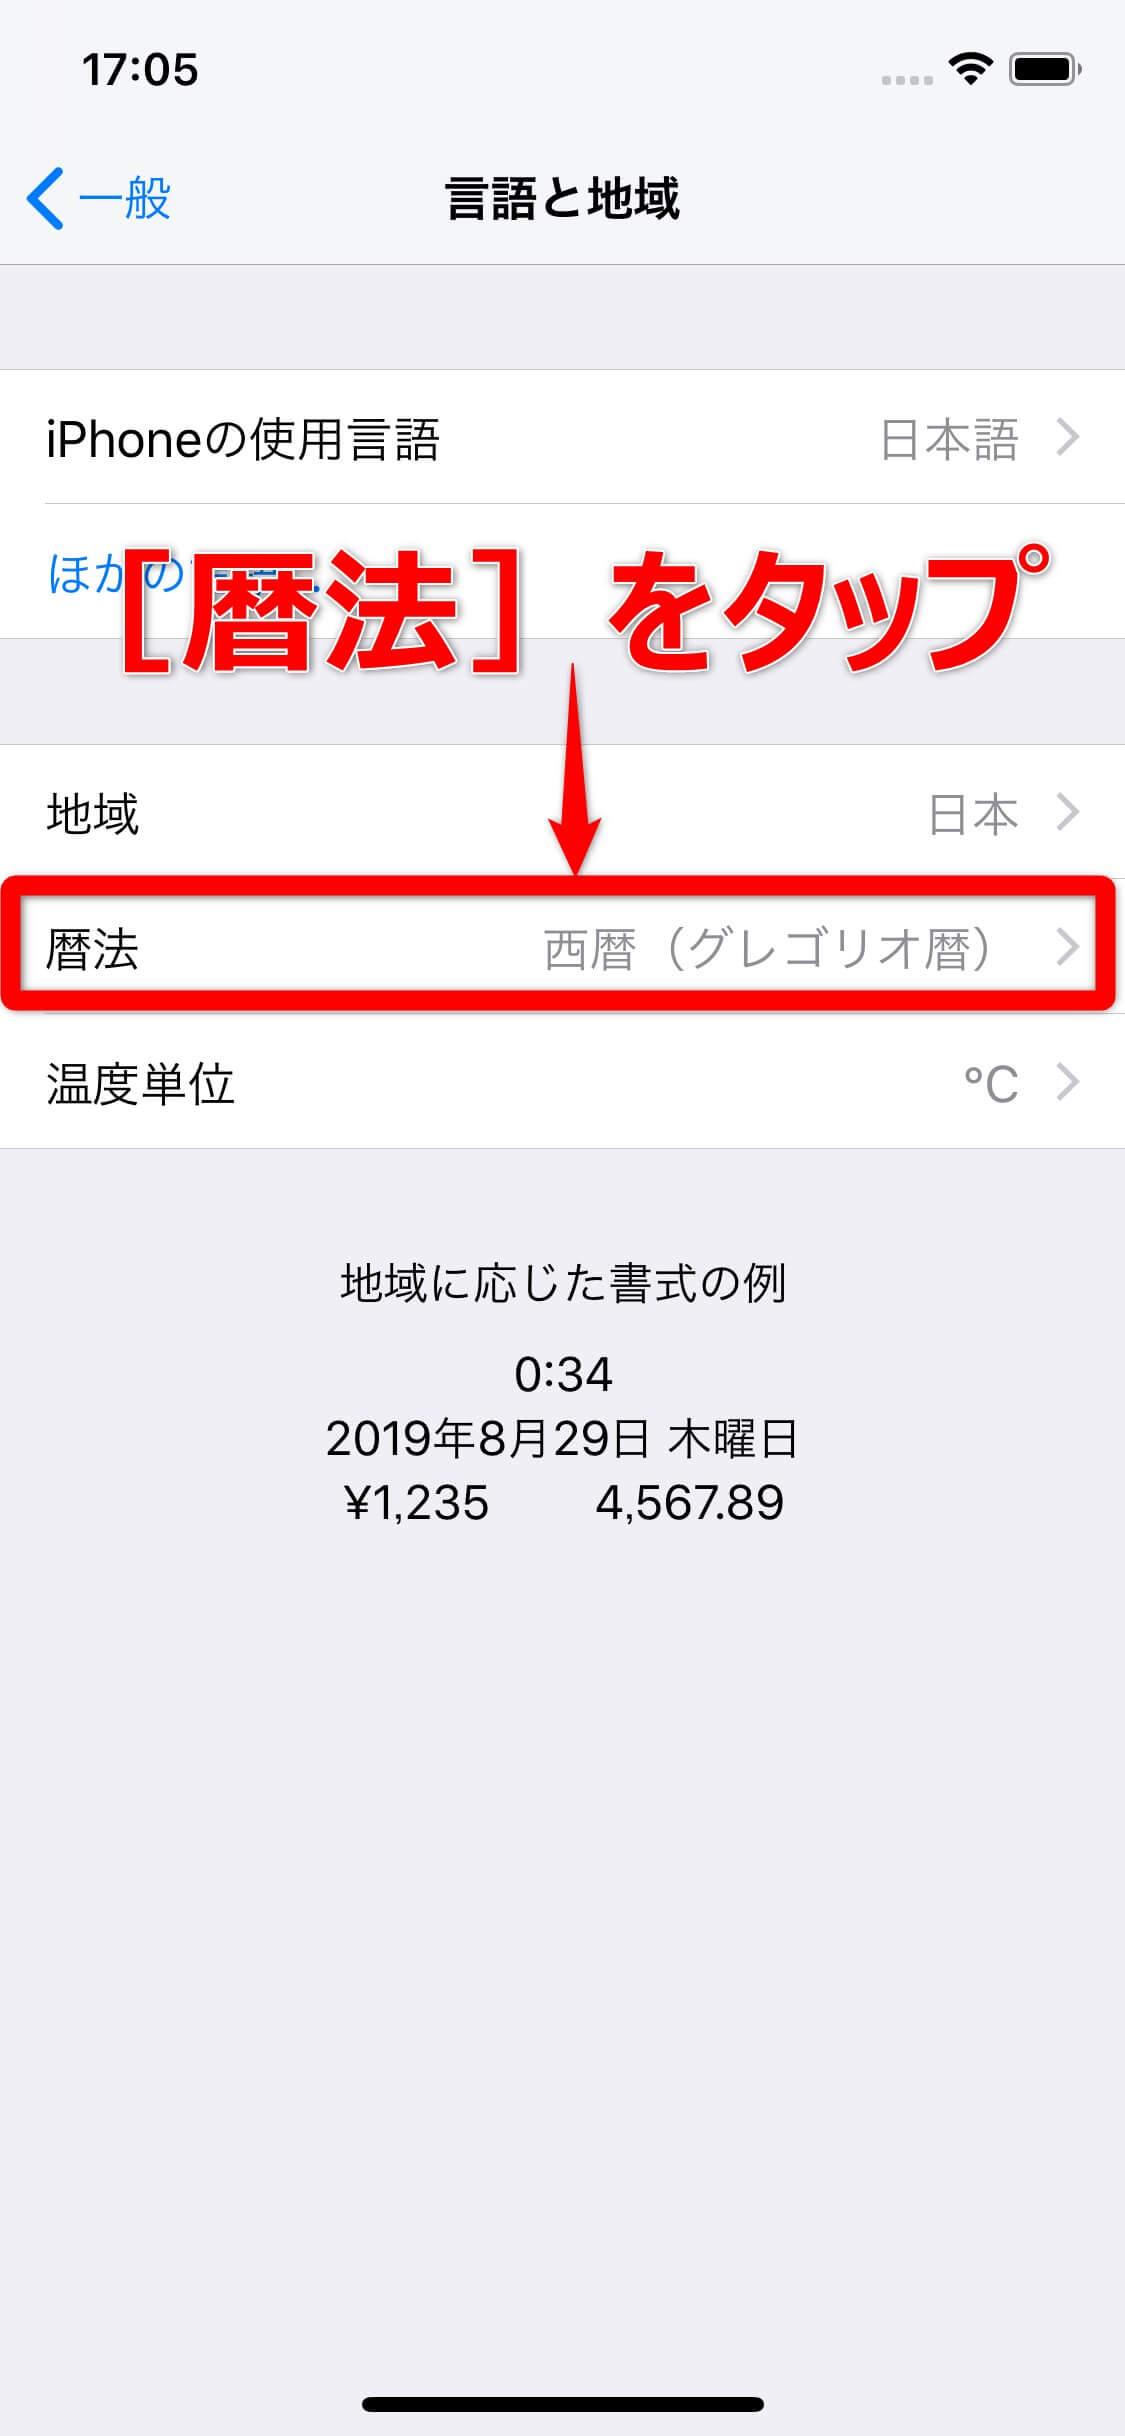 iPhone(アイフォーン)の設定アプリの「言語と地域」画面